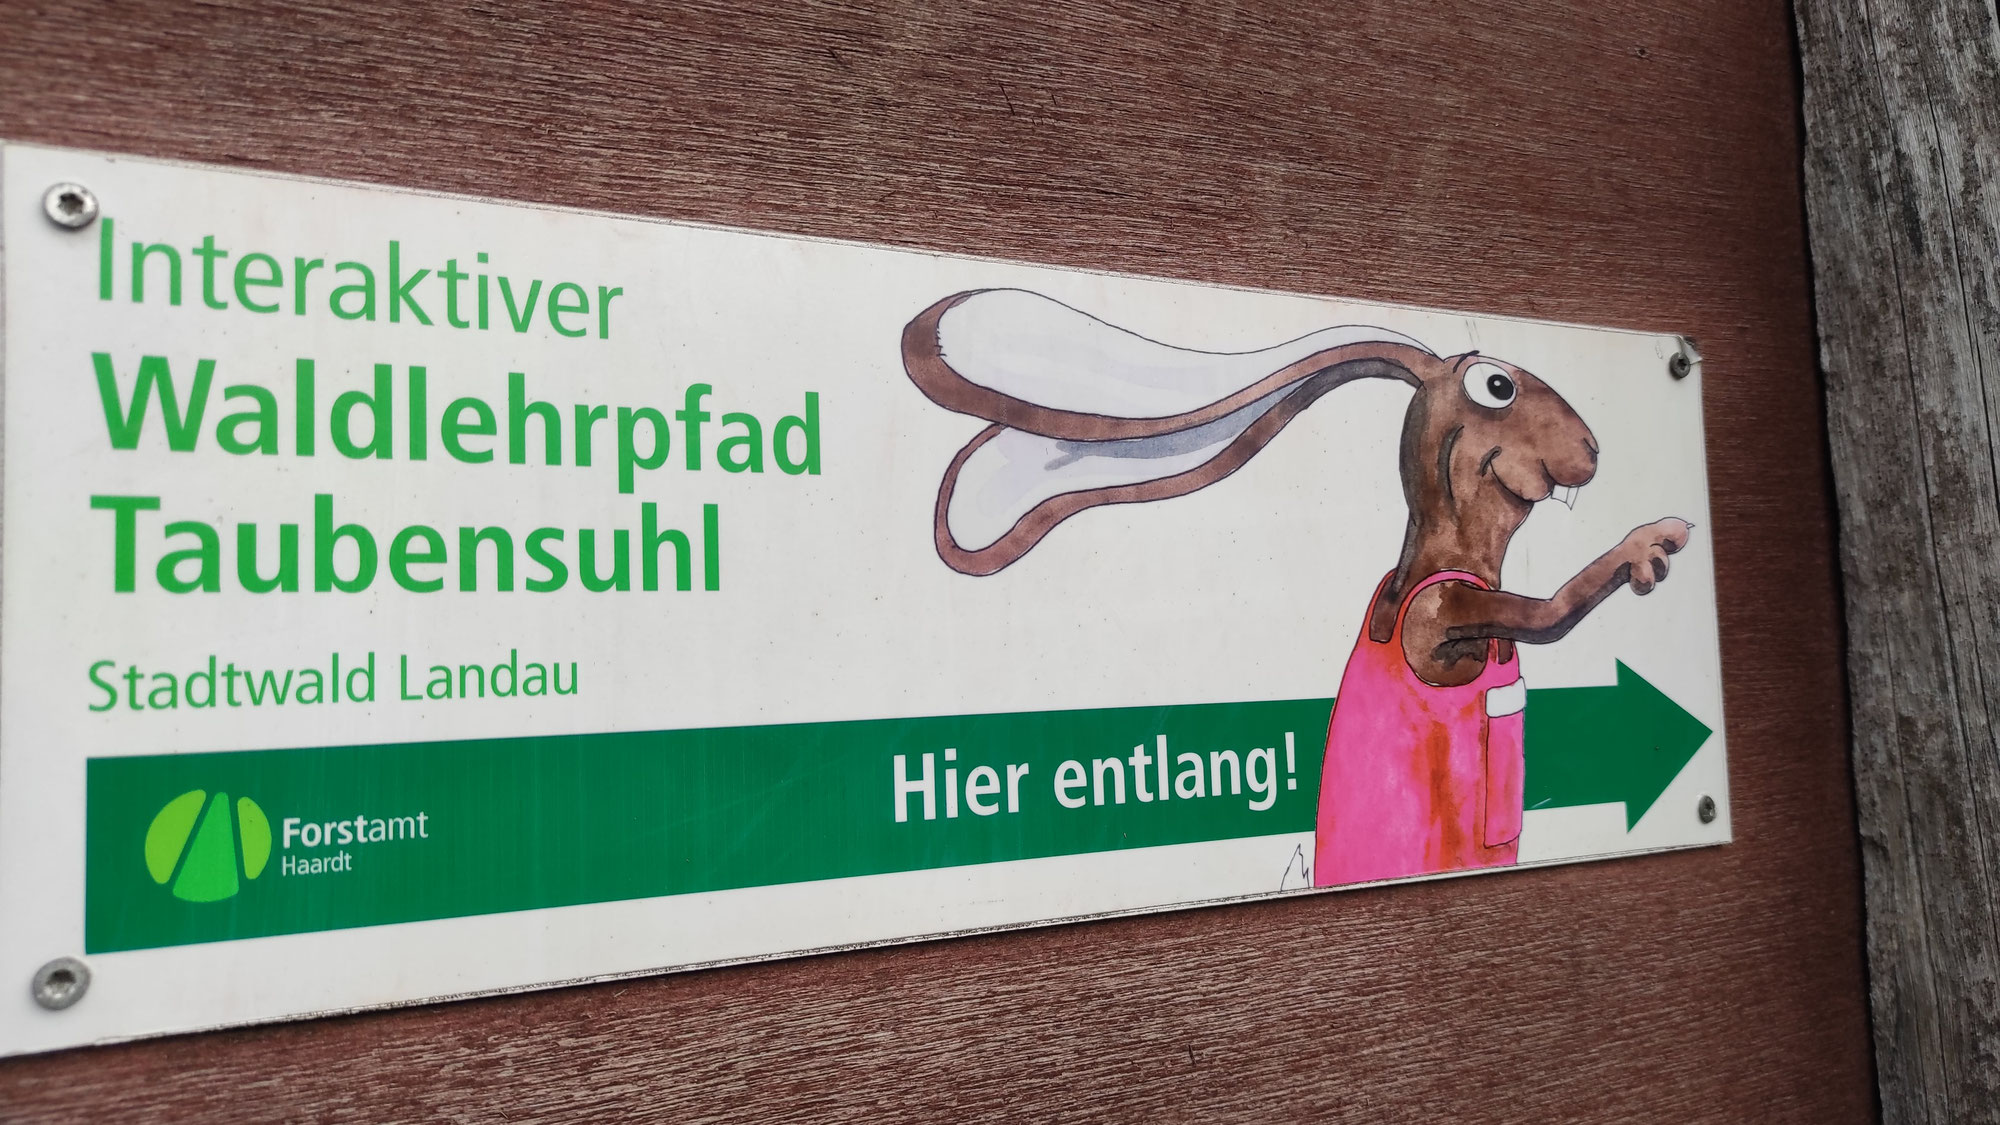 Waldlehrpfad Taubensuhl